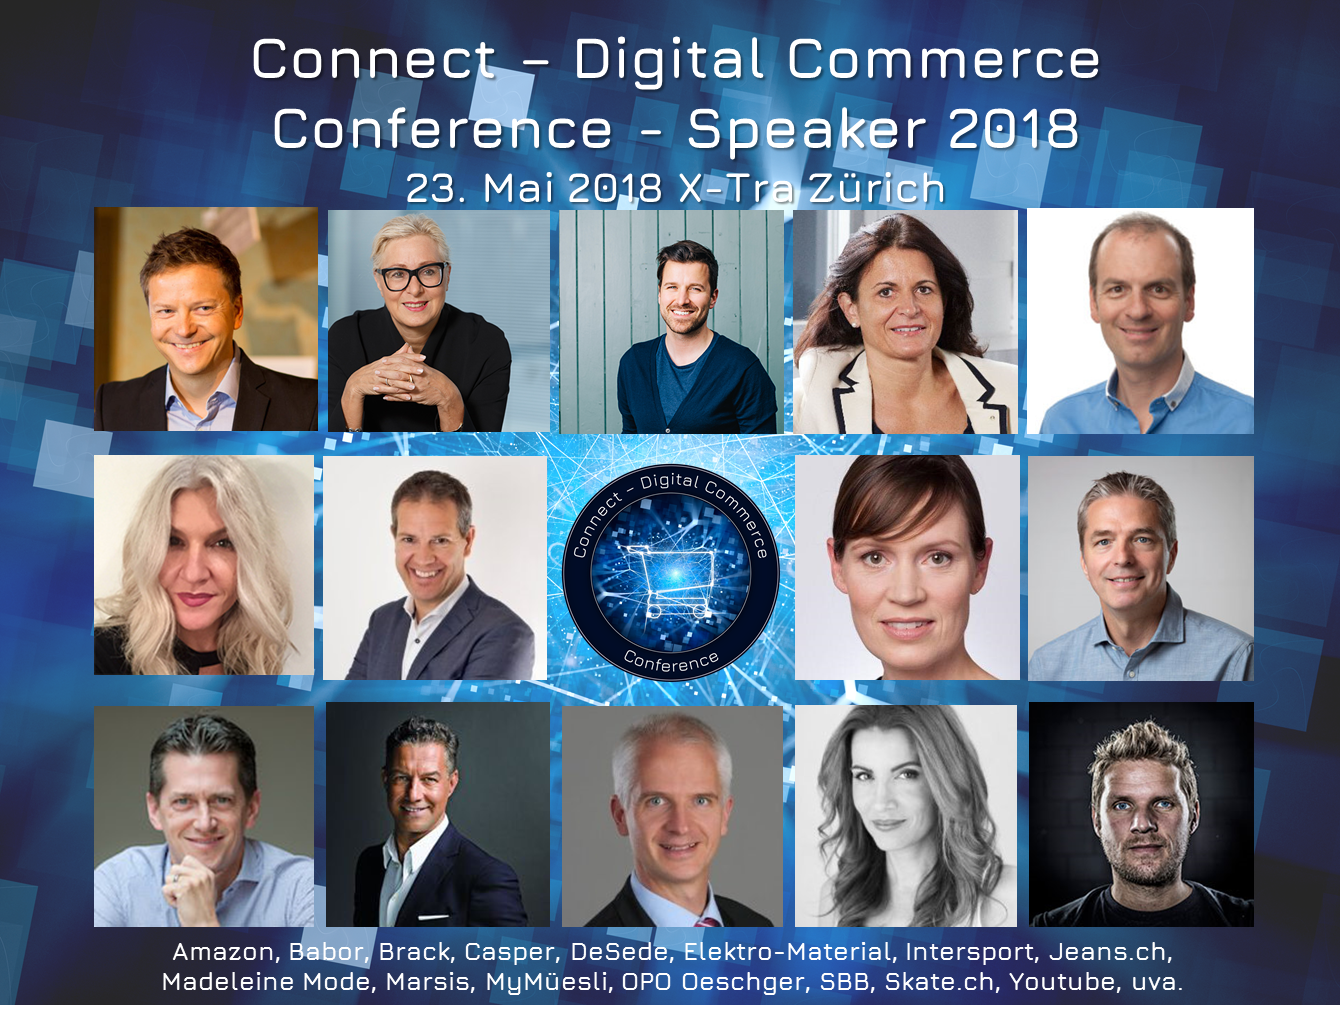 Auswahl Speaker 2018 der Connect - Digital Commerce Conference